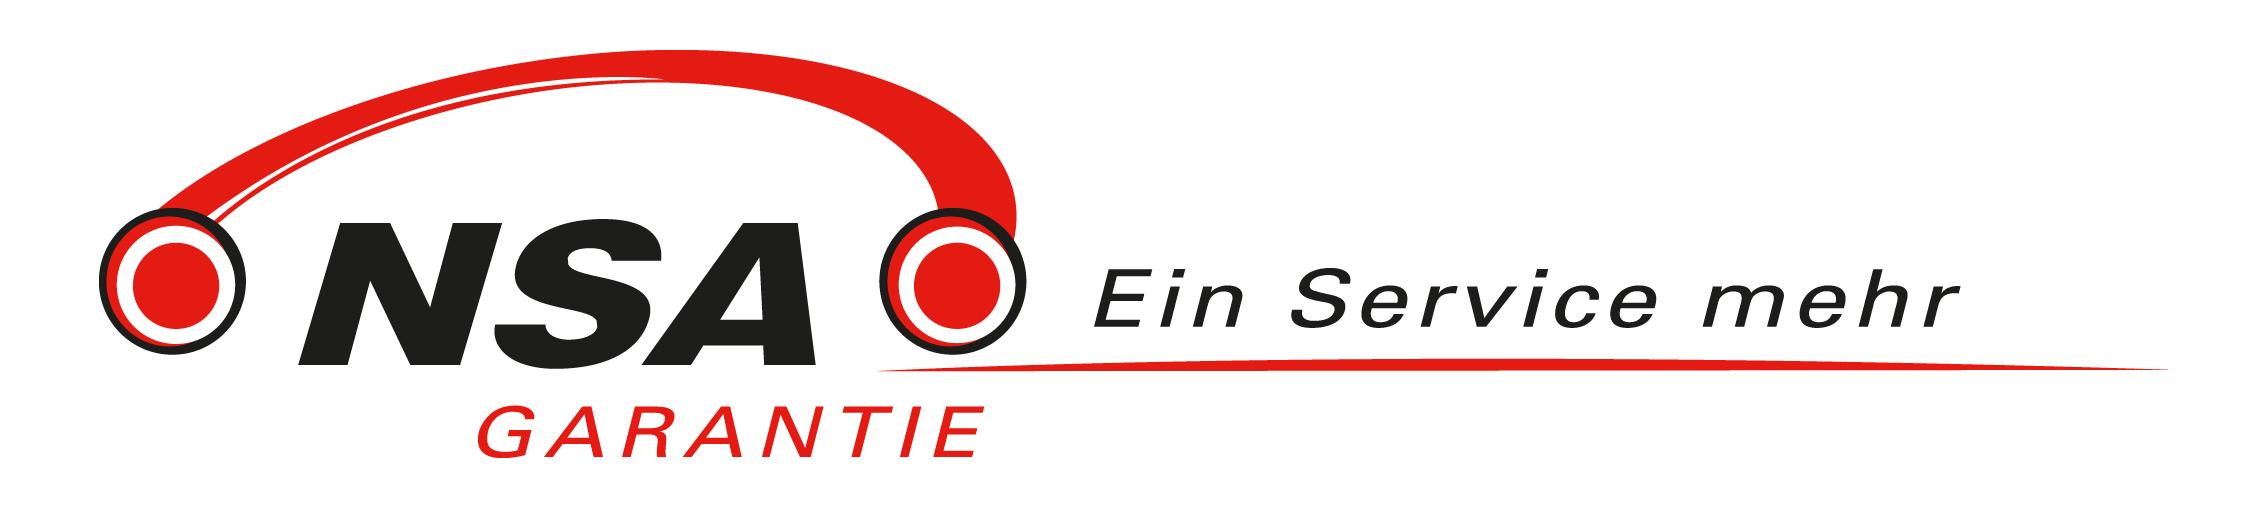 nsa-garantie-logo